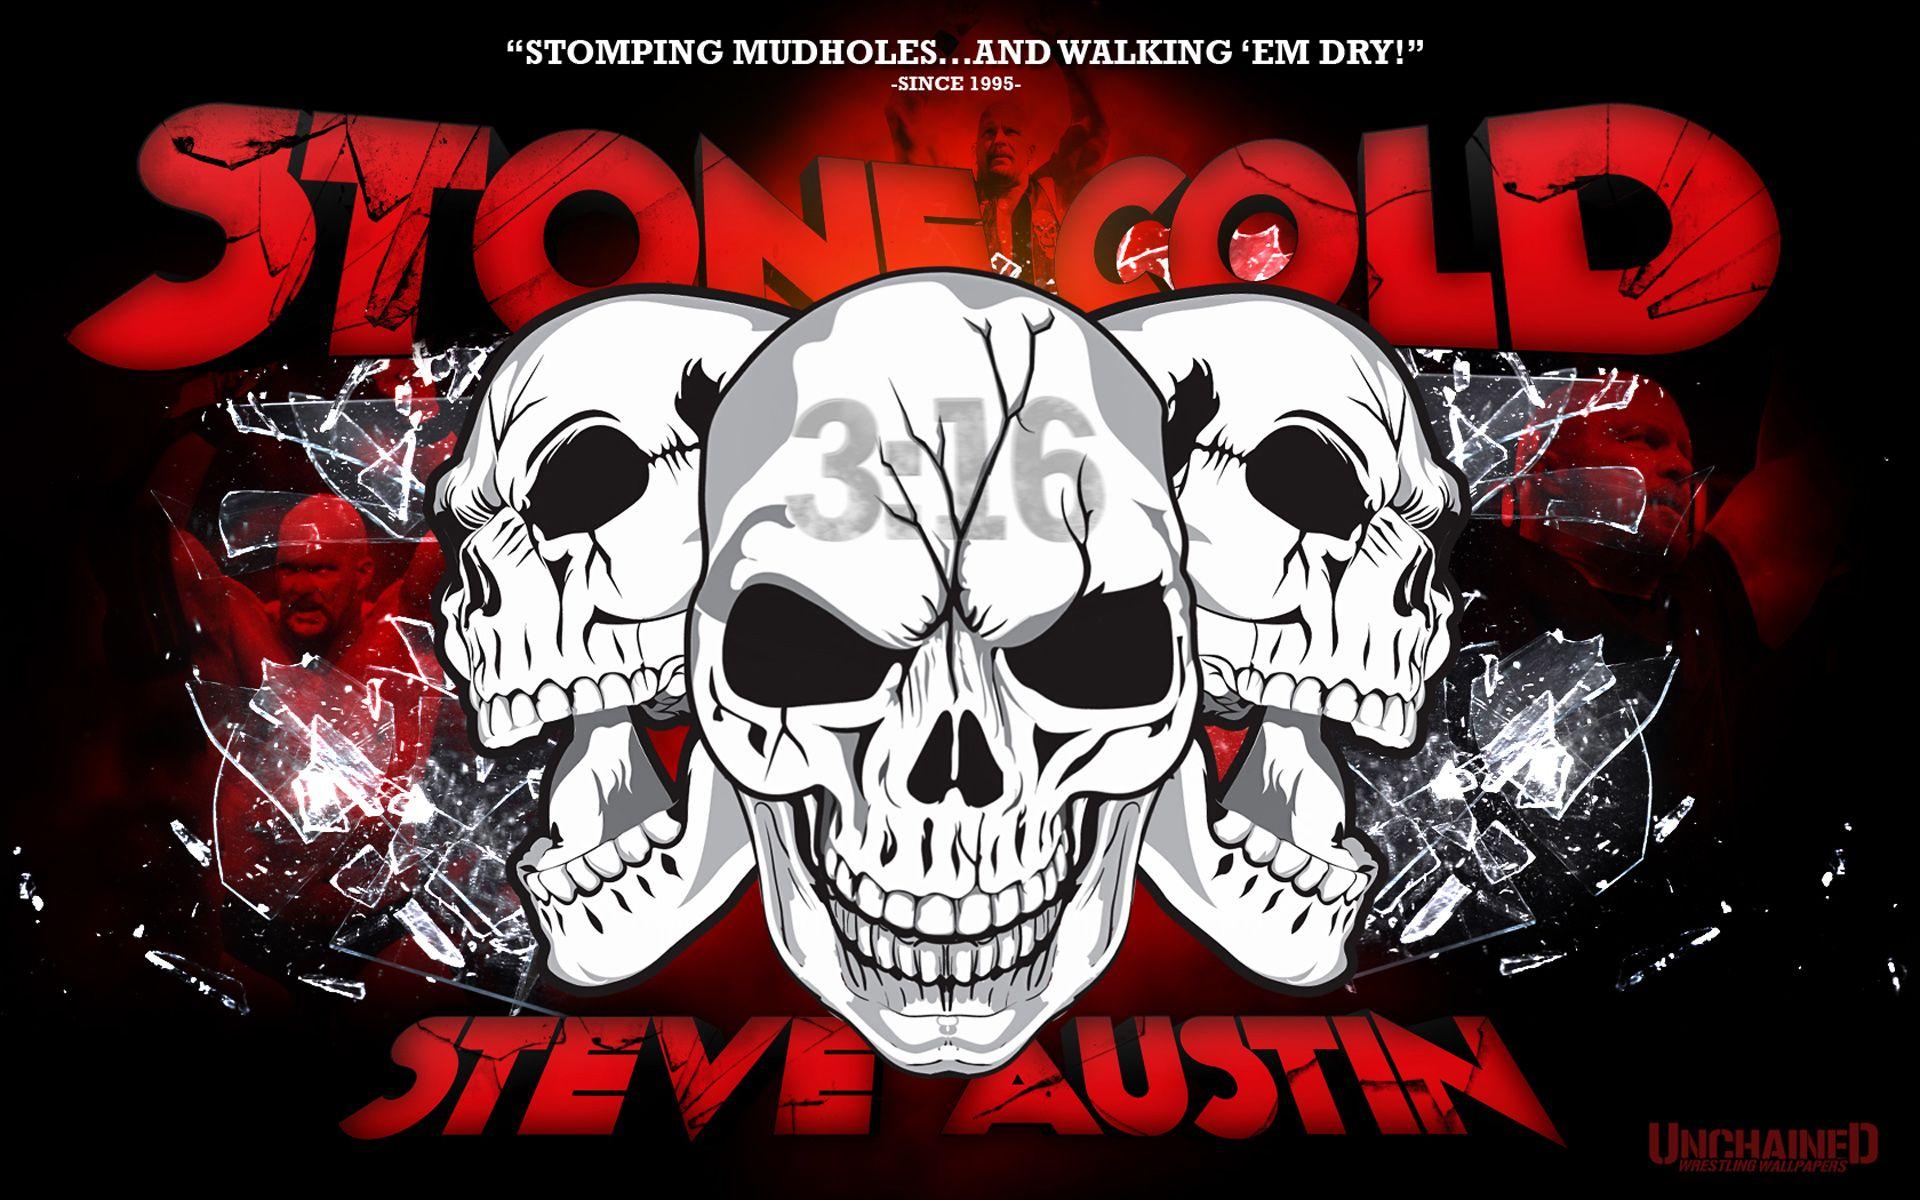 Stone Cold Steve Austin 3 16 Wallpaper Download Stone Cold